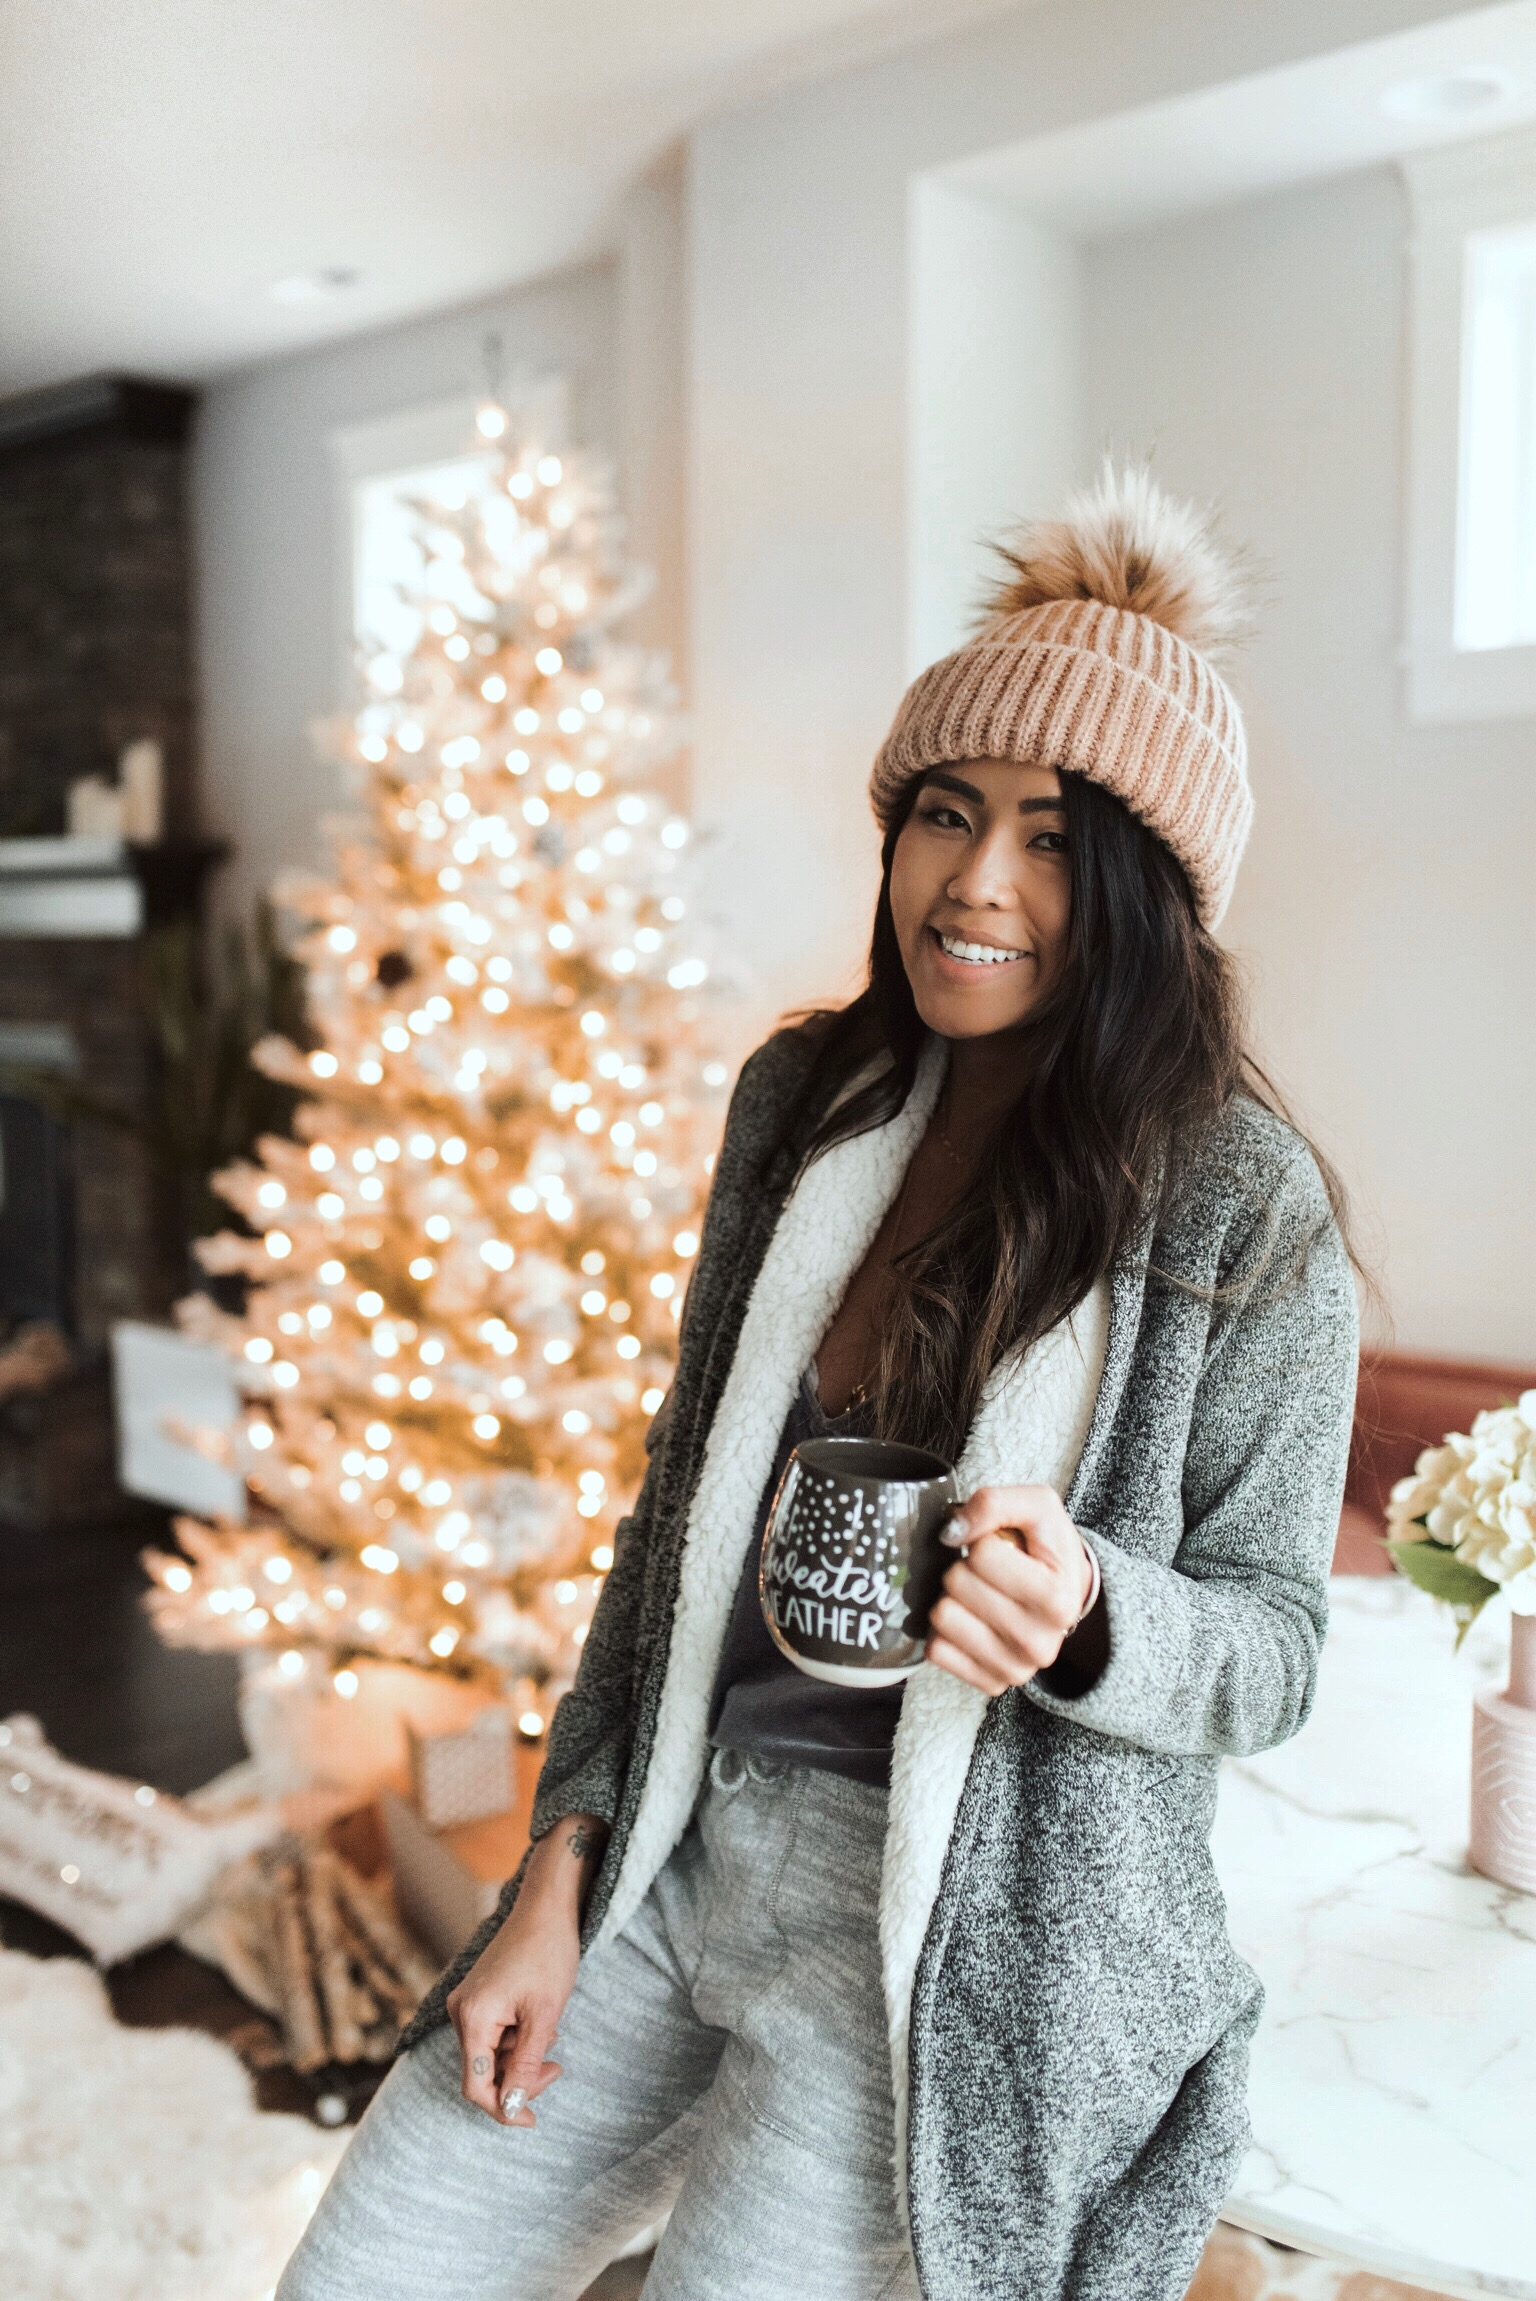 Abercrombie & Fitch Loungewear Pajama Cozy Gifts